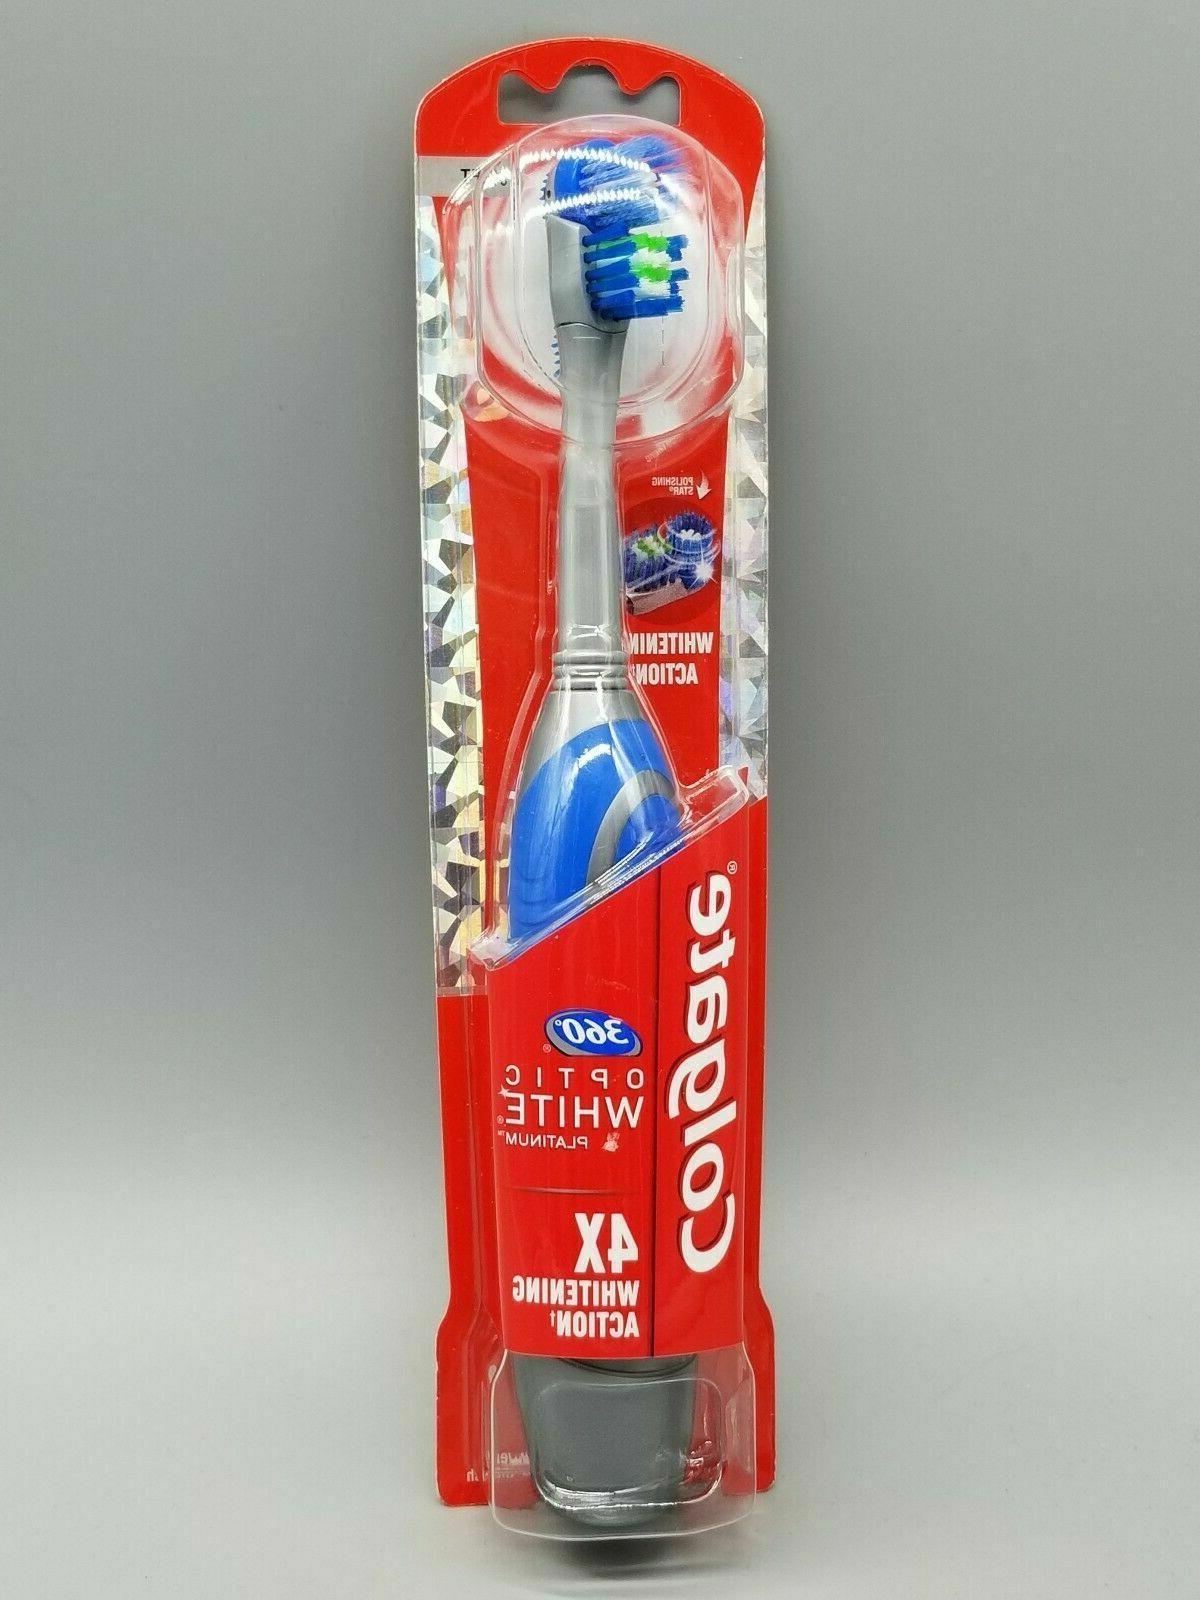 Colgate 360 Optic White Battery-Powered Toothbrush, Soft, 1